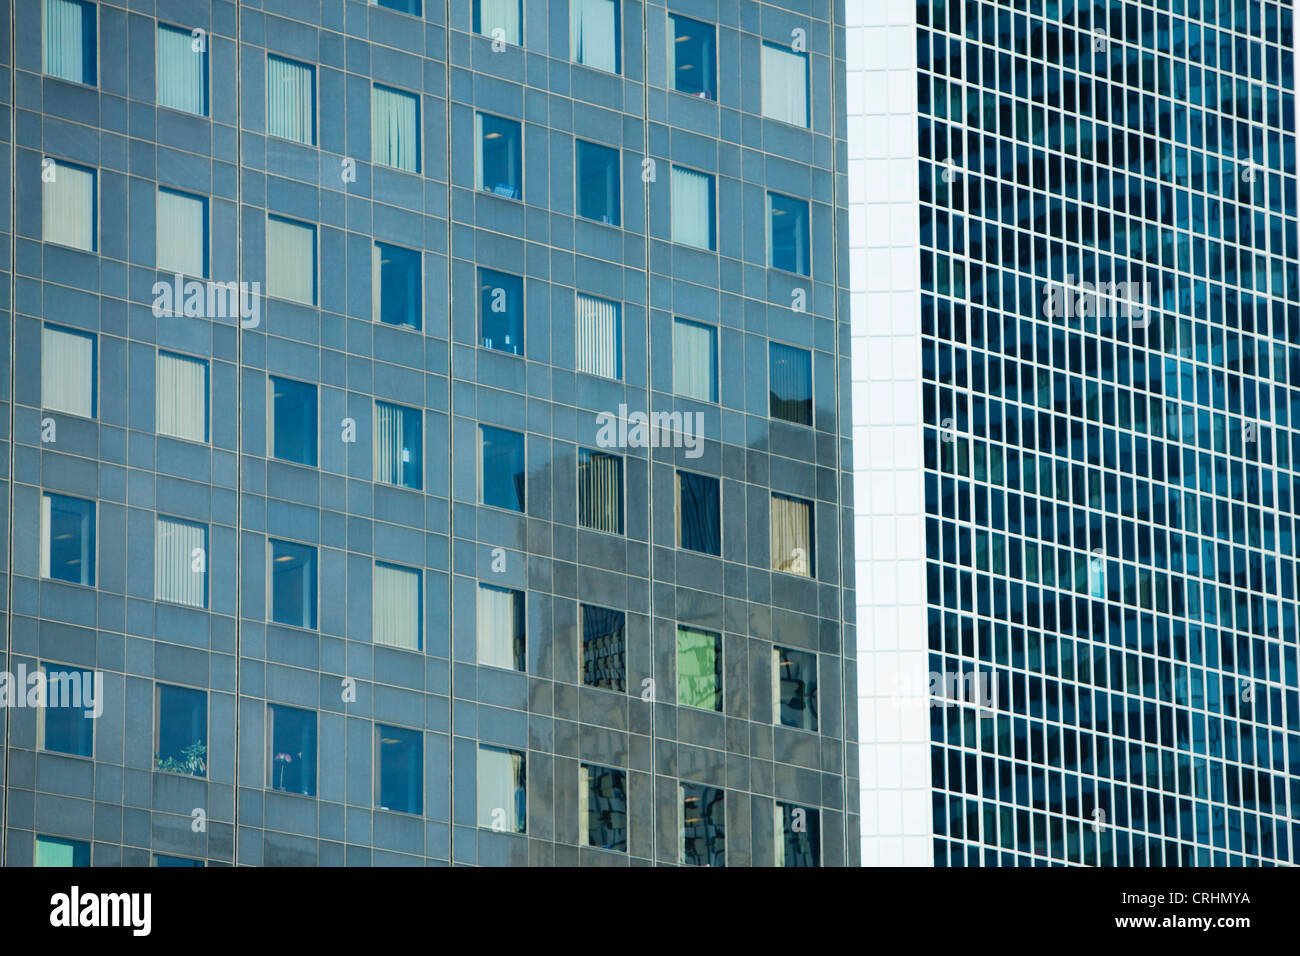 Modern building facades, full frame - Stock Image